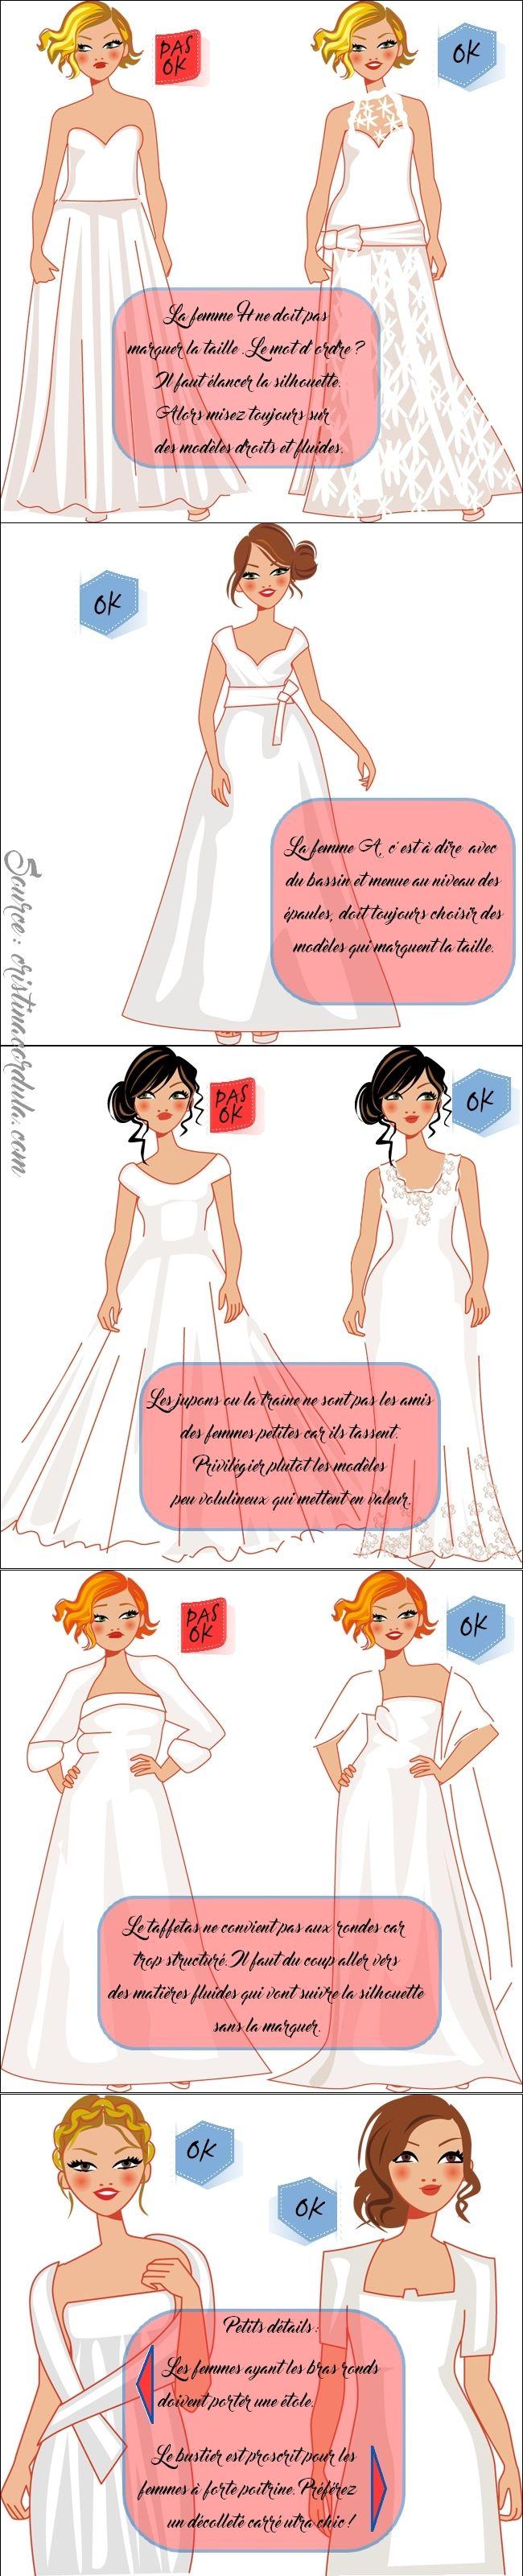 Bien choisir sa robe de mariée suivant sa morphologie, par Cristina Cordula. Crédits images  : cristinacordula.com